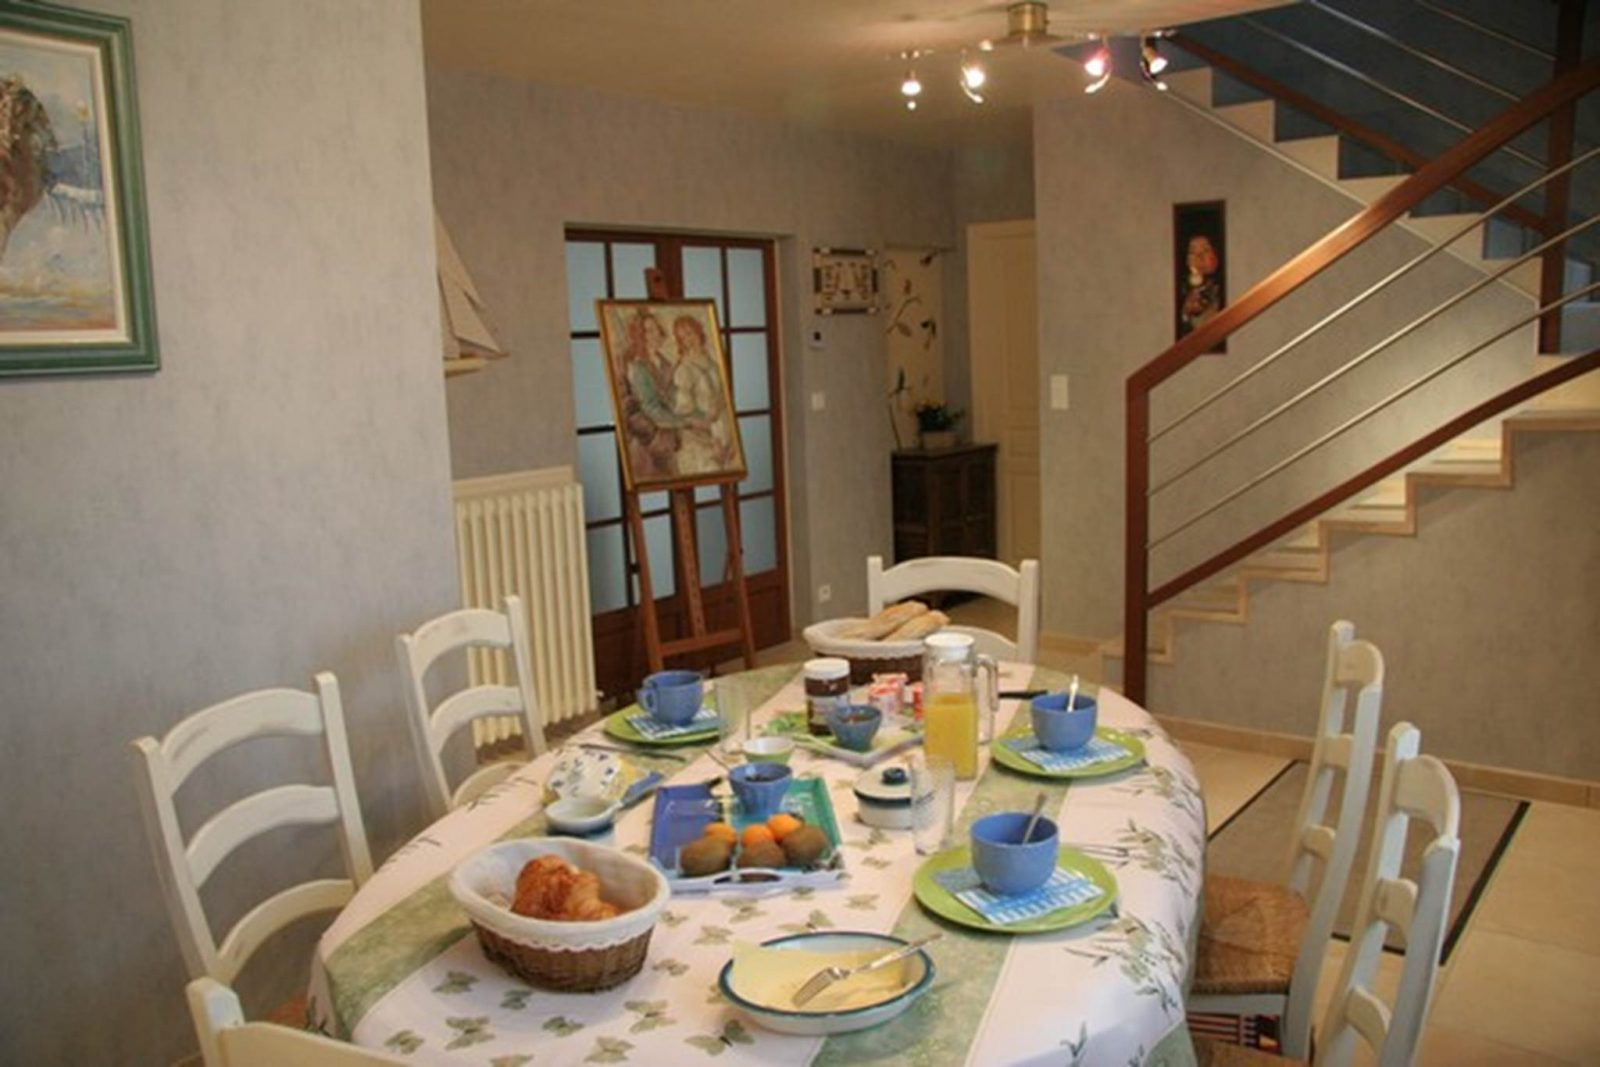 Chambres d'hôtes L'Asphodèle Ambon Morbihan